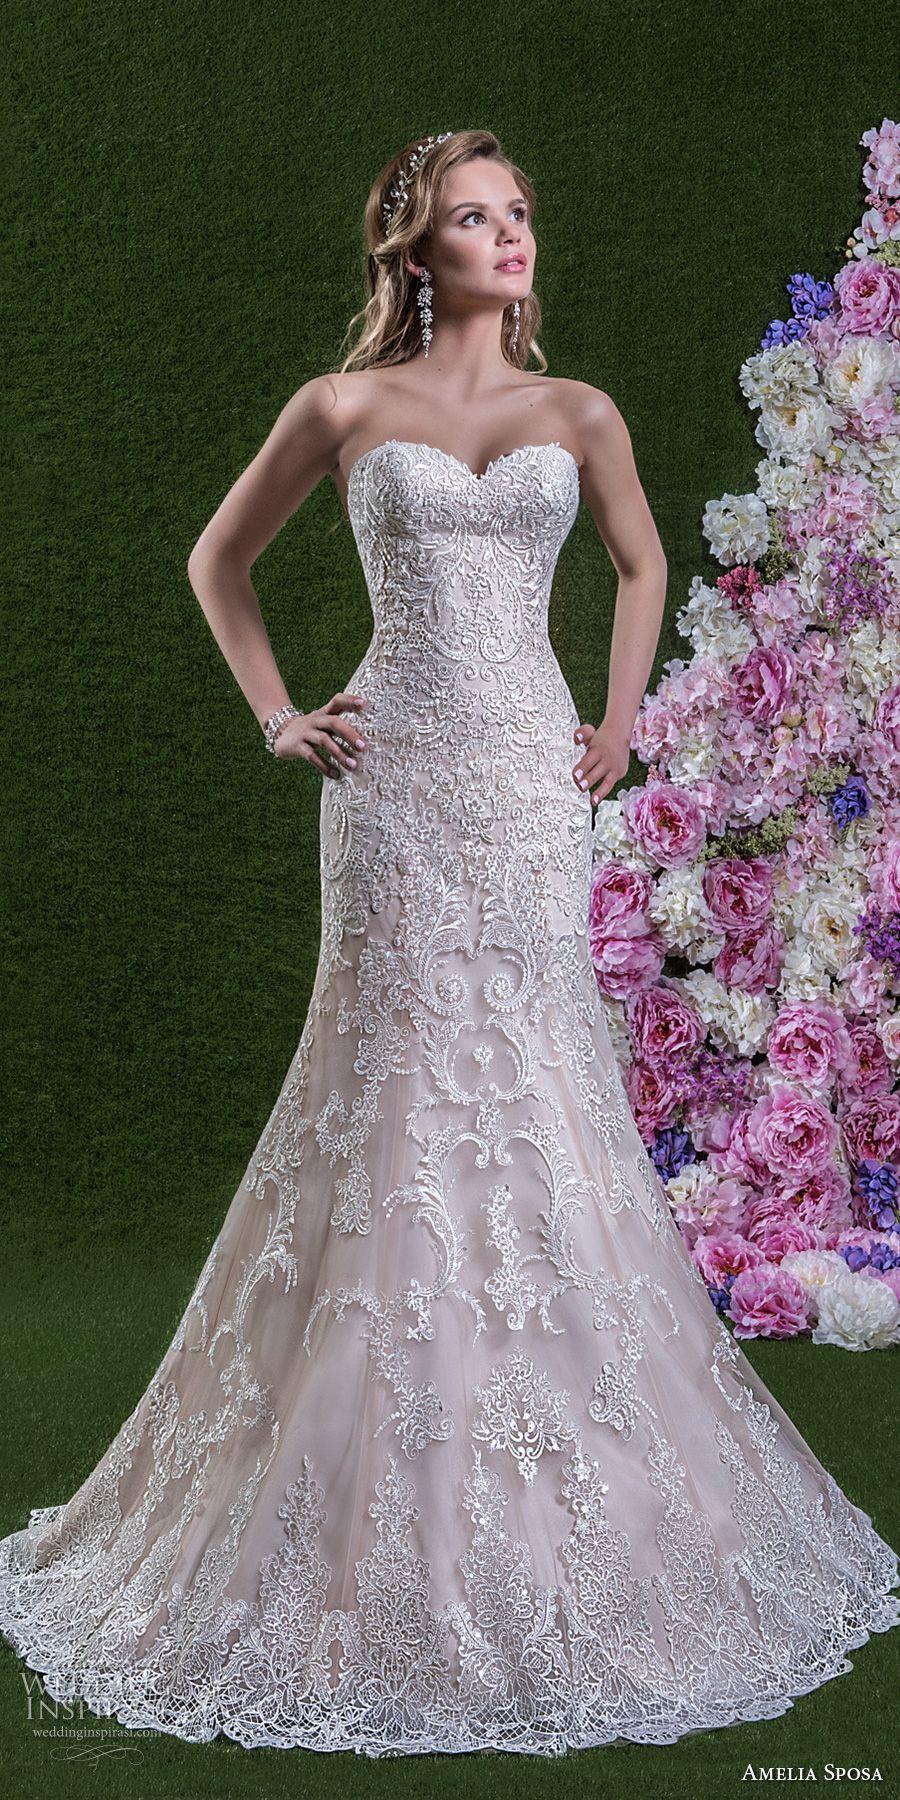 Amelia Sposa Wedding Dresses Pre-Owned